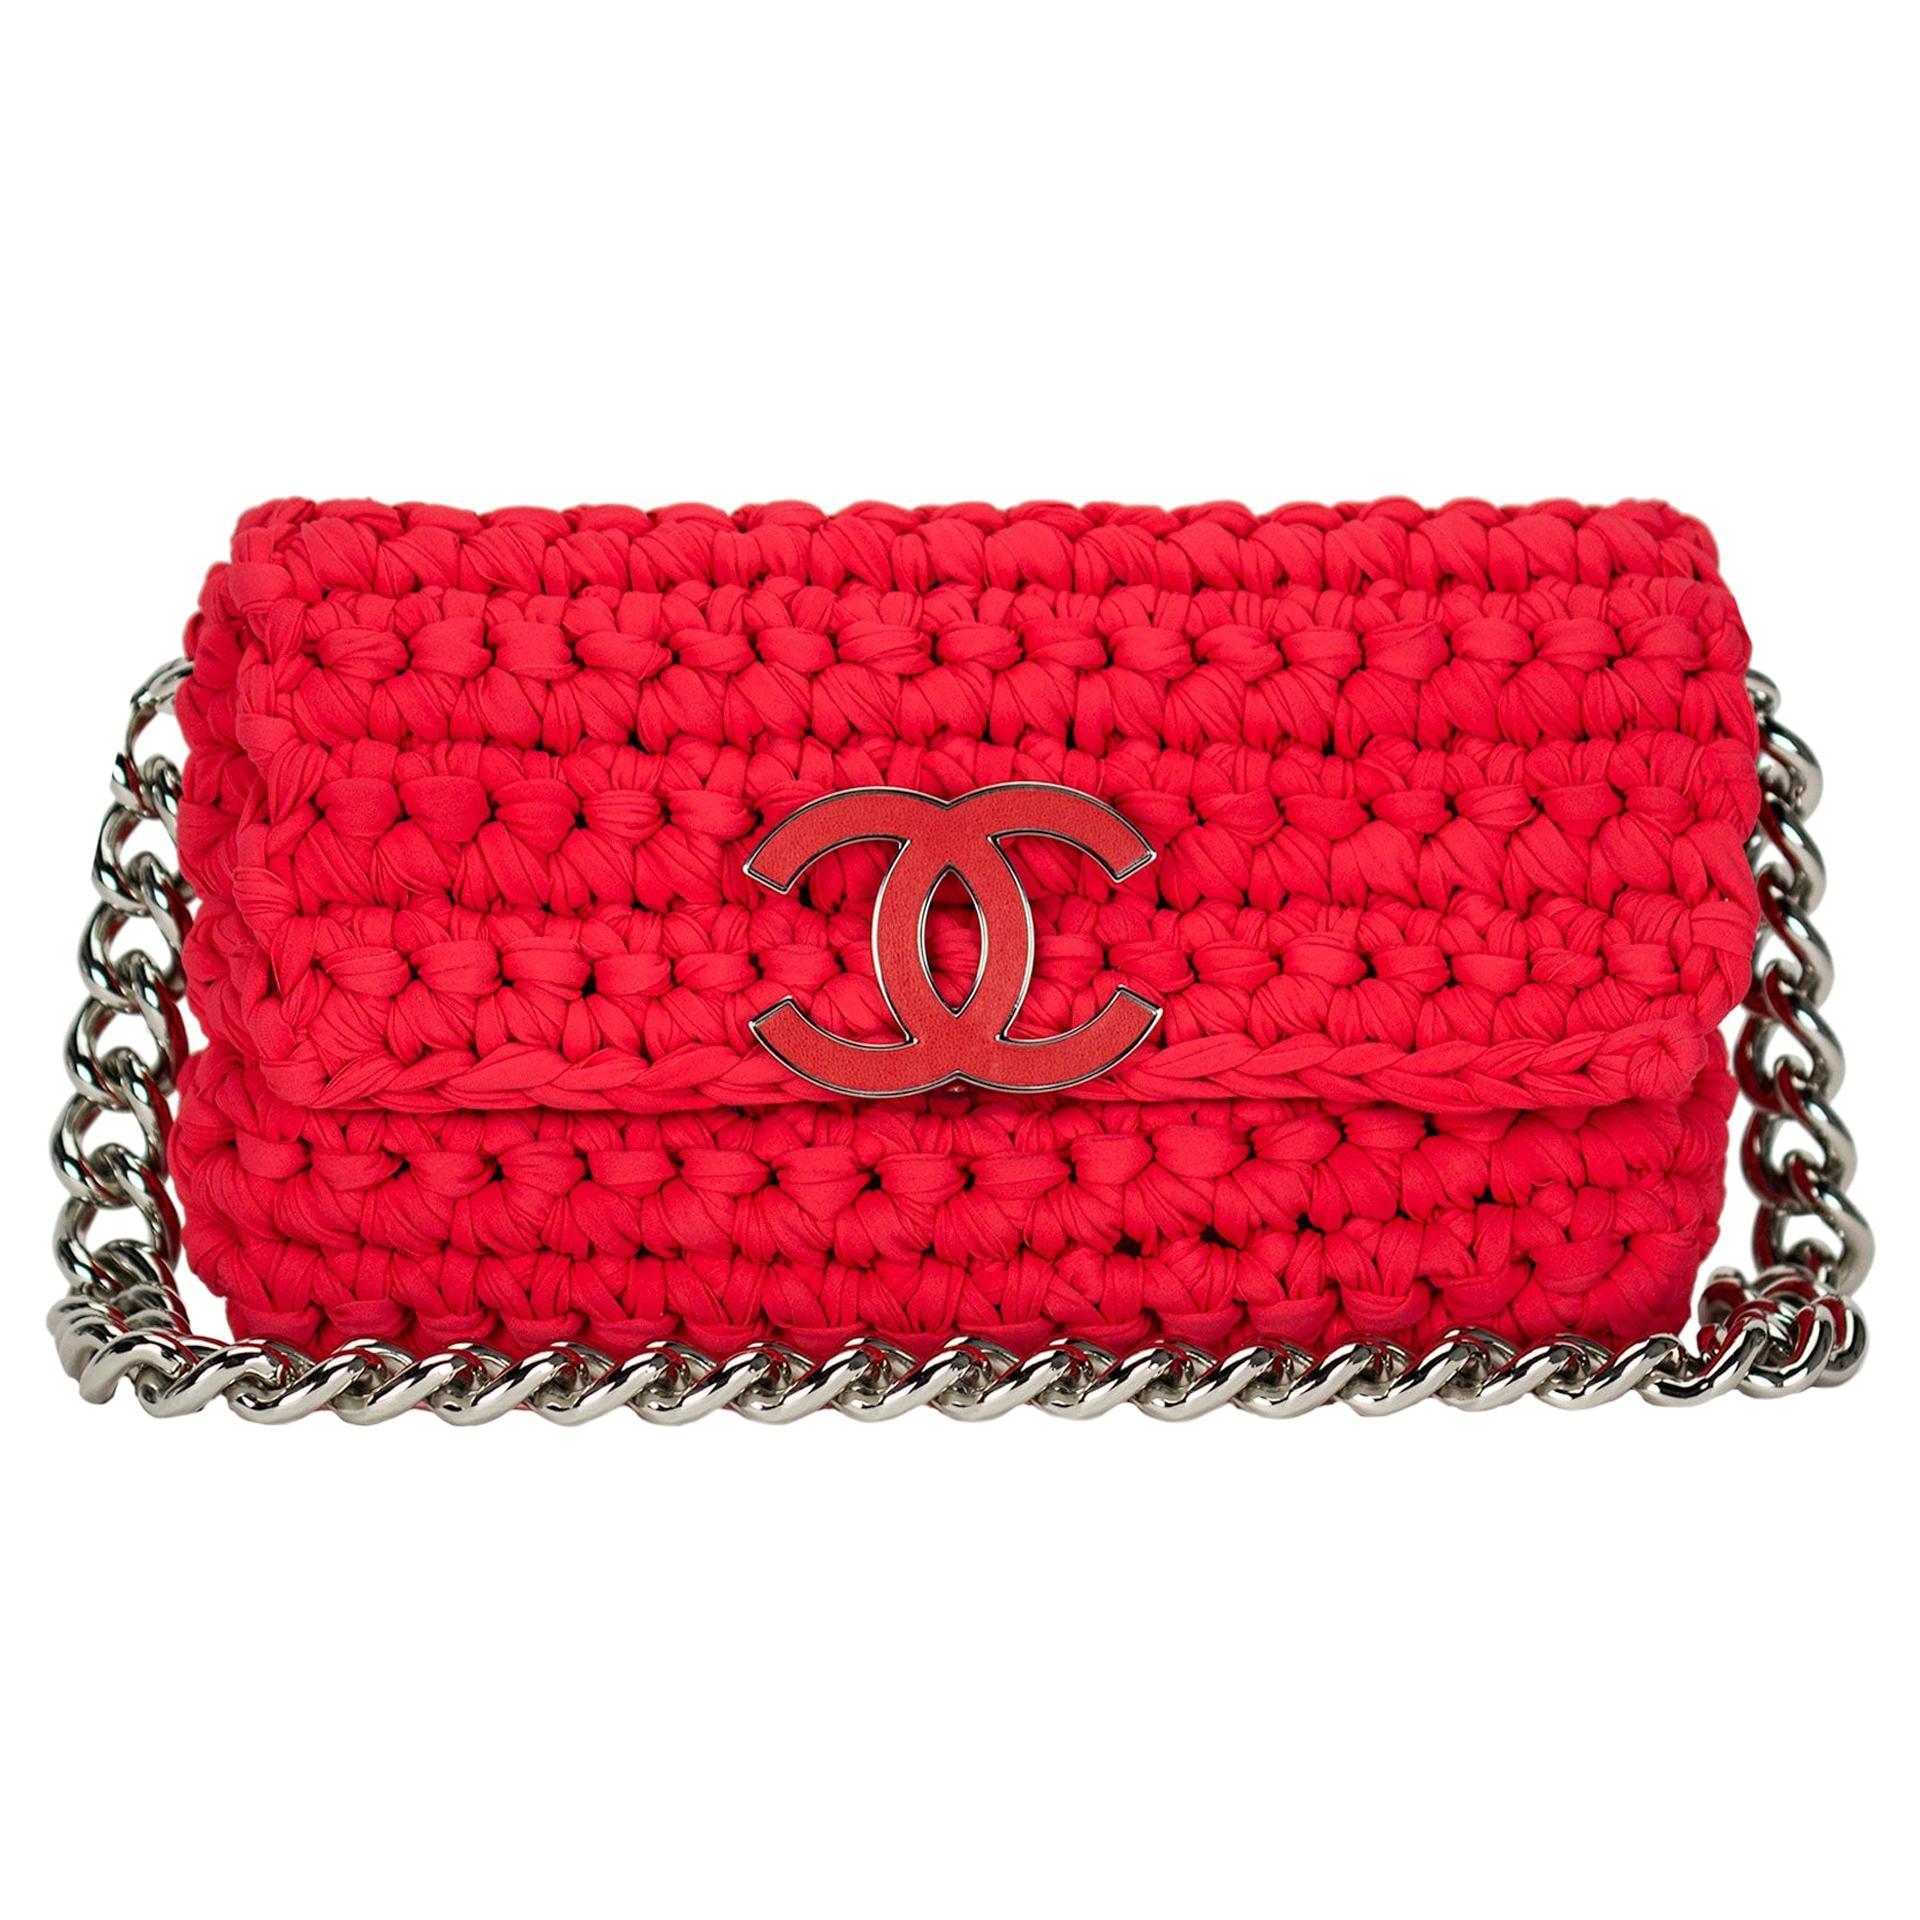 Chanel Red Cruise Crochet Logo Flap Bag